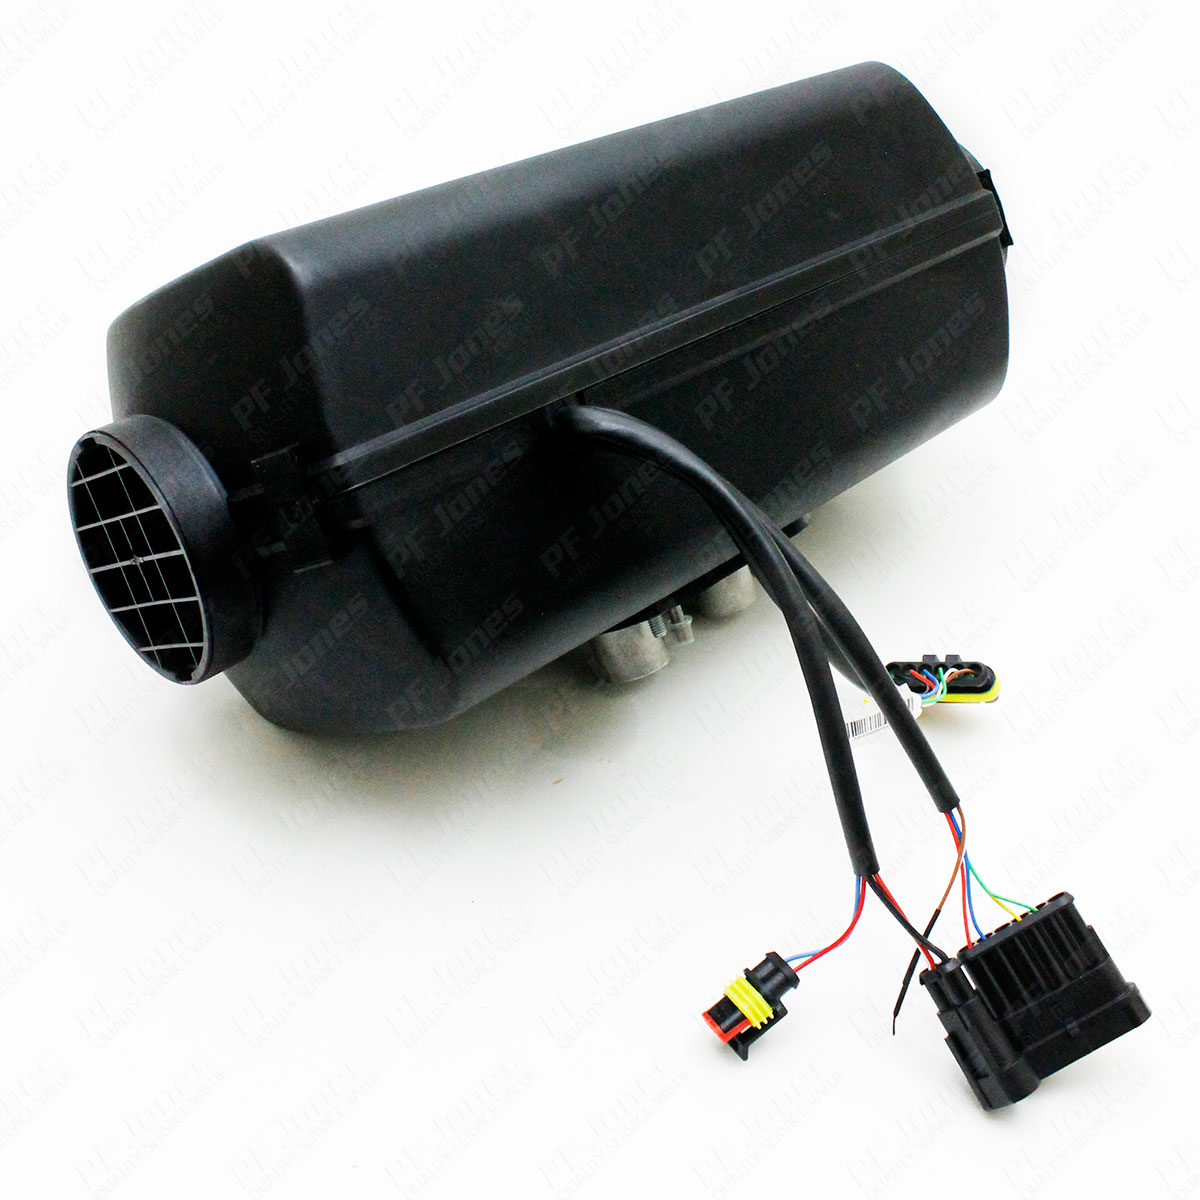 Planar Marine 44D Air Heater - 4kW/12V - Medium - 2 Outlet Kit